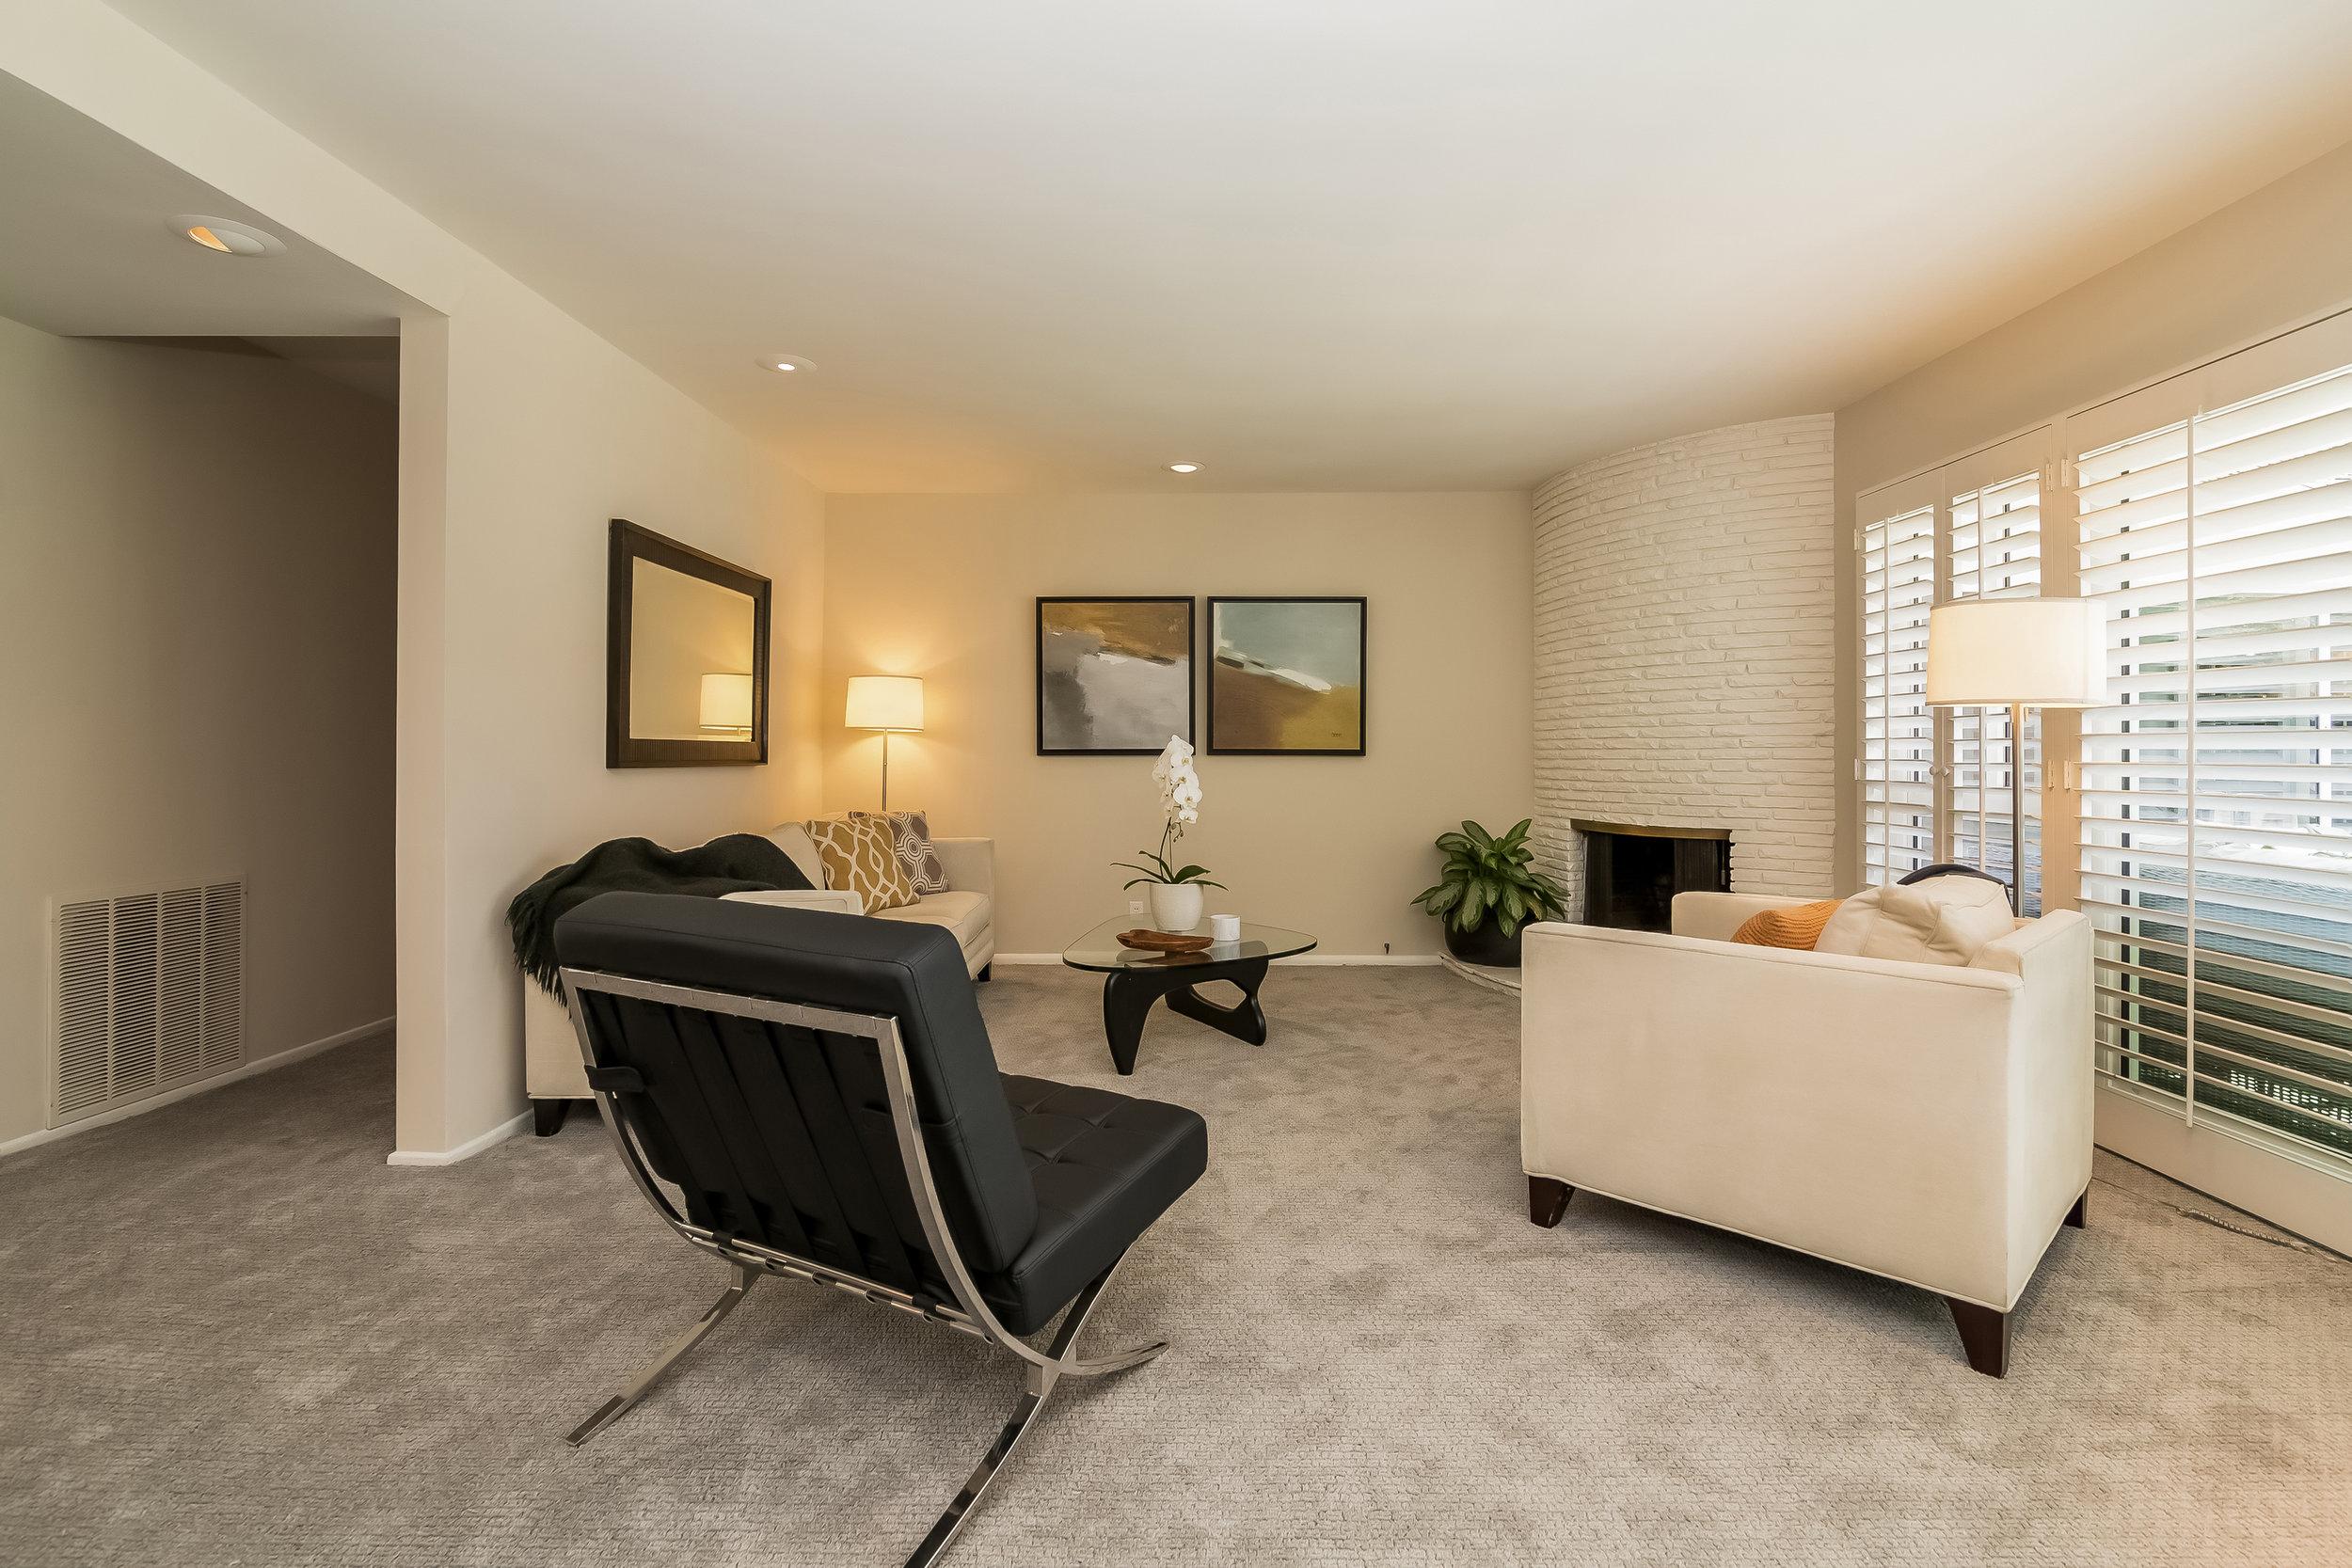 012-Living_Room-2805337-large copy.jpg